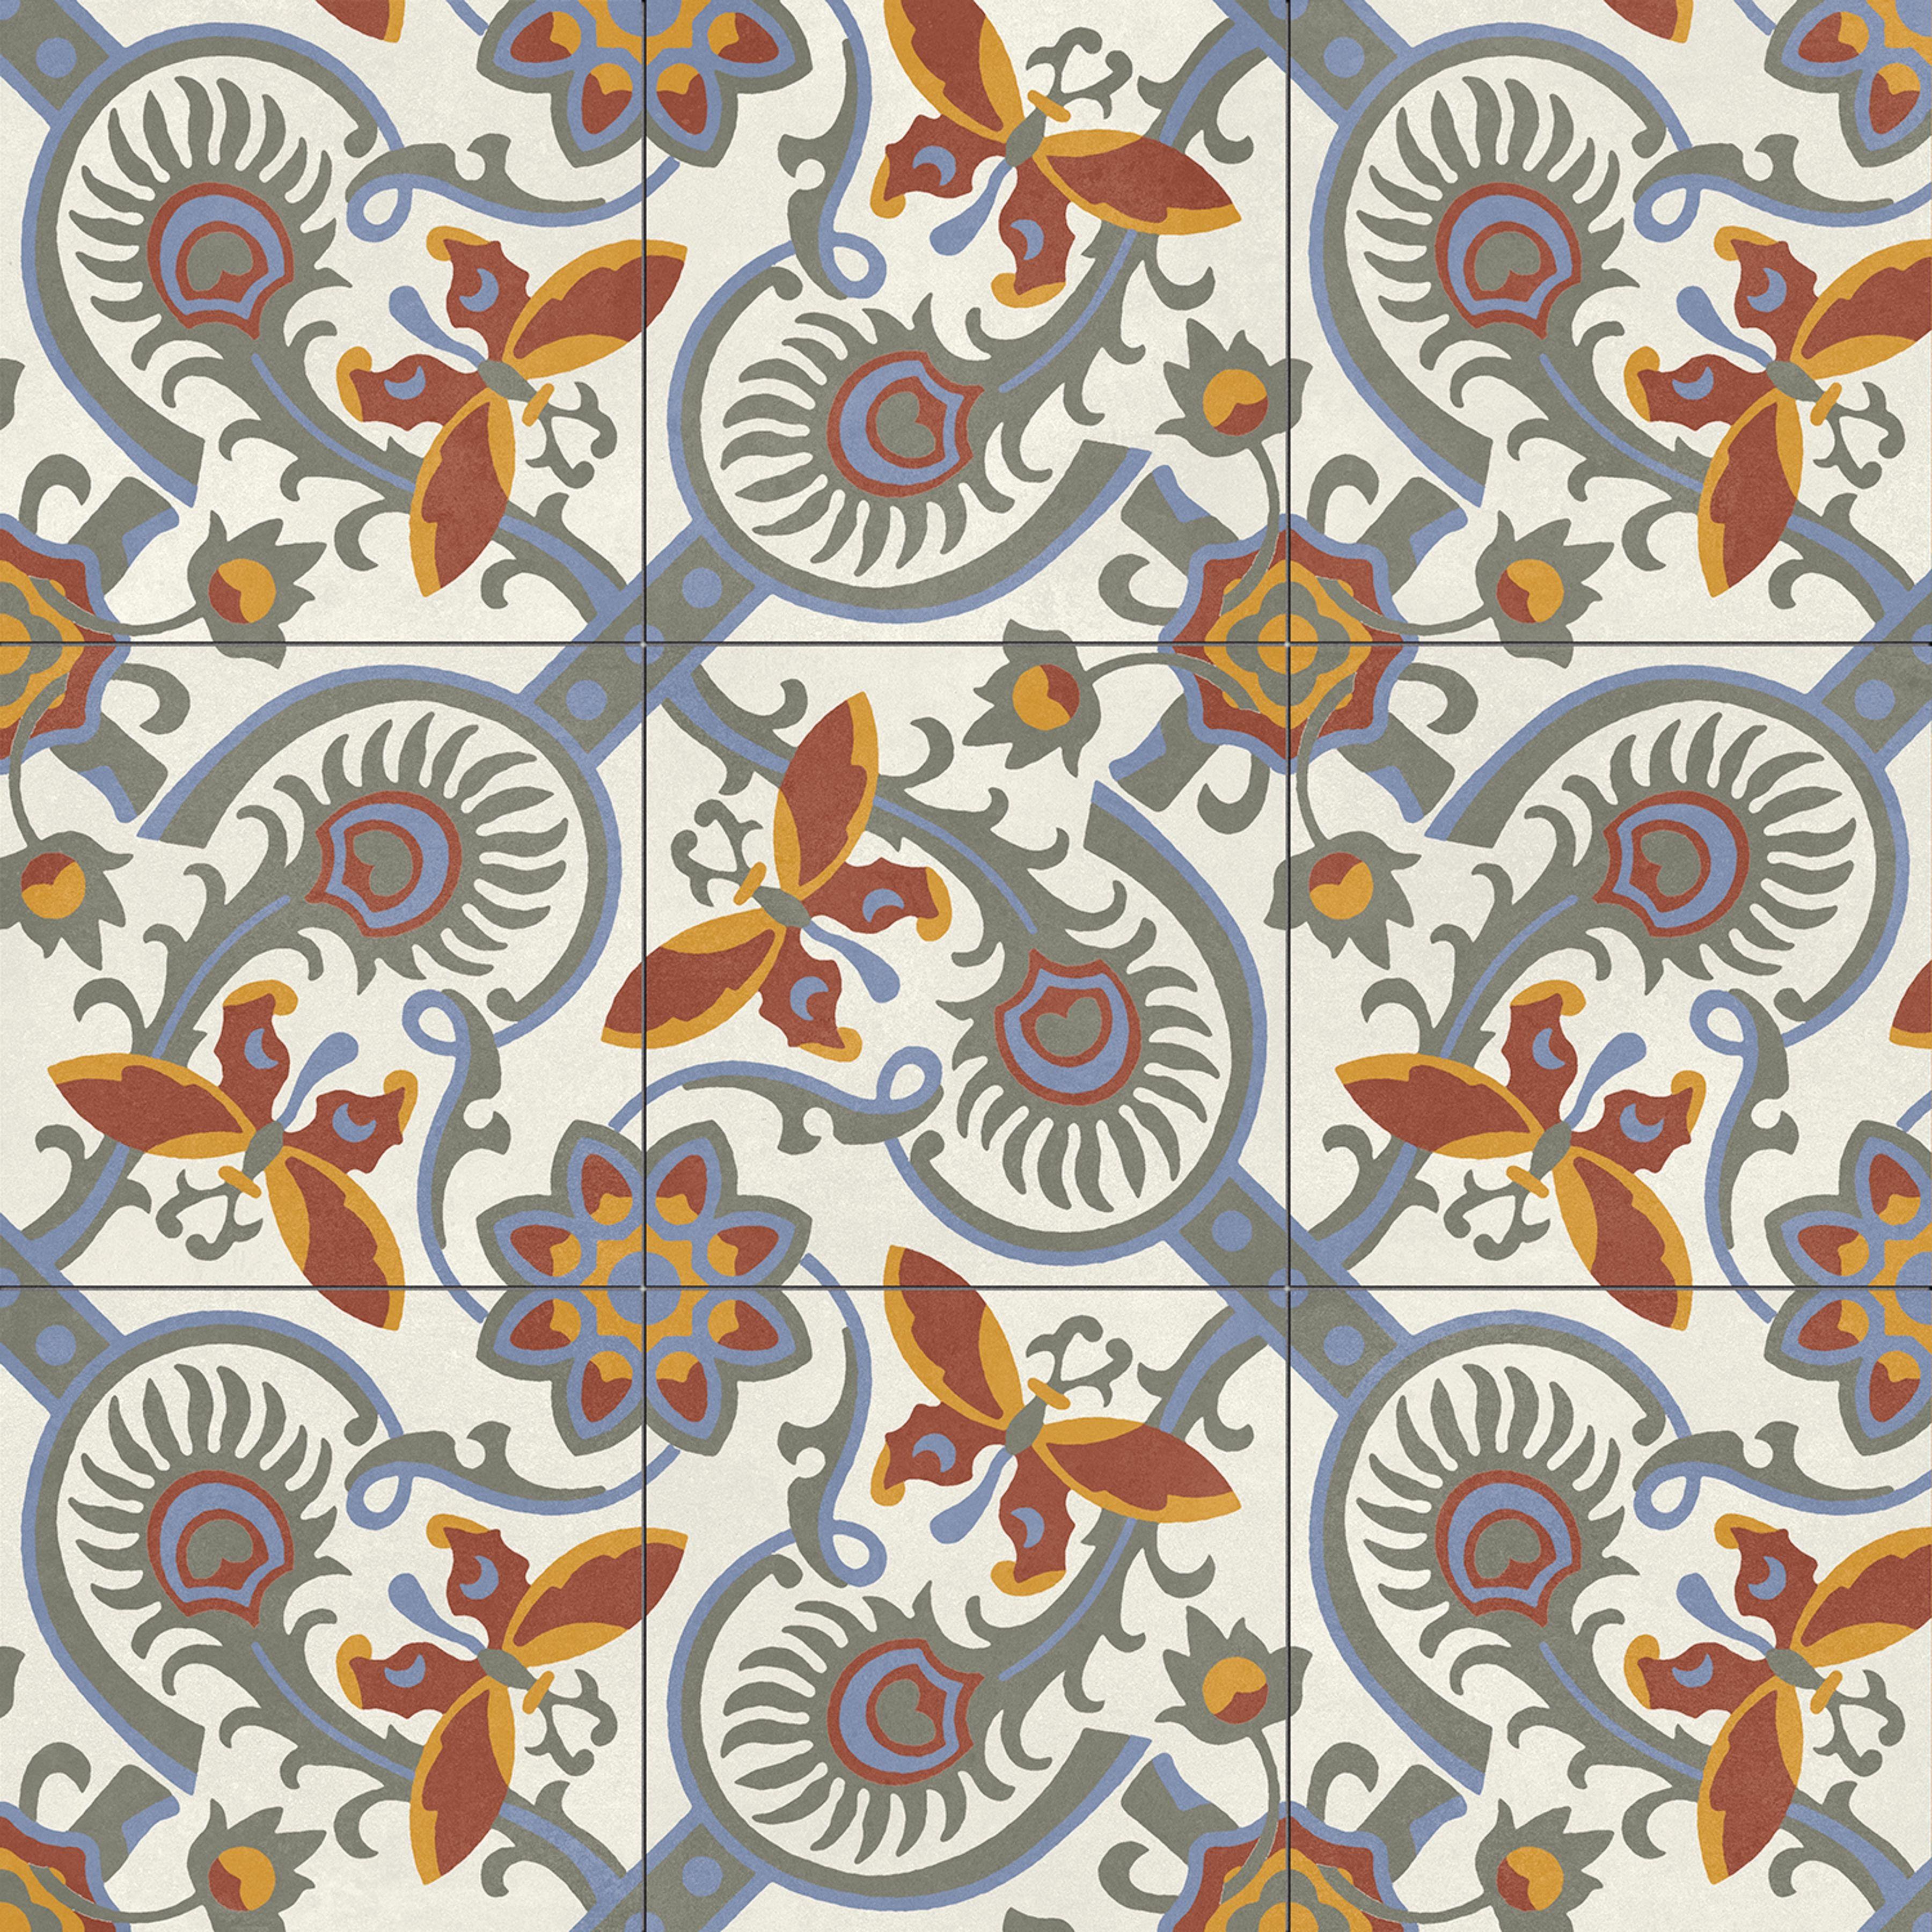 Altea Alba Natural 59.2x59.2 płytka patchwork